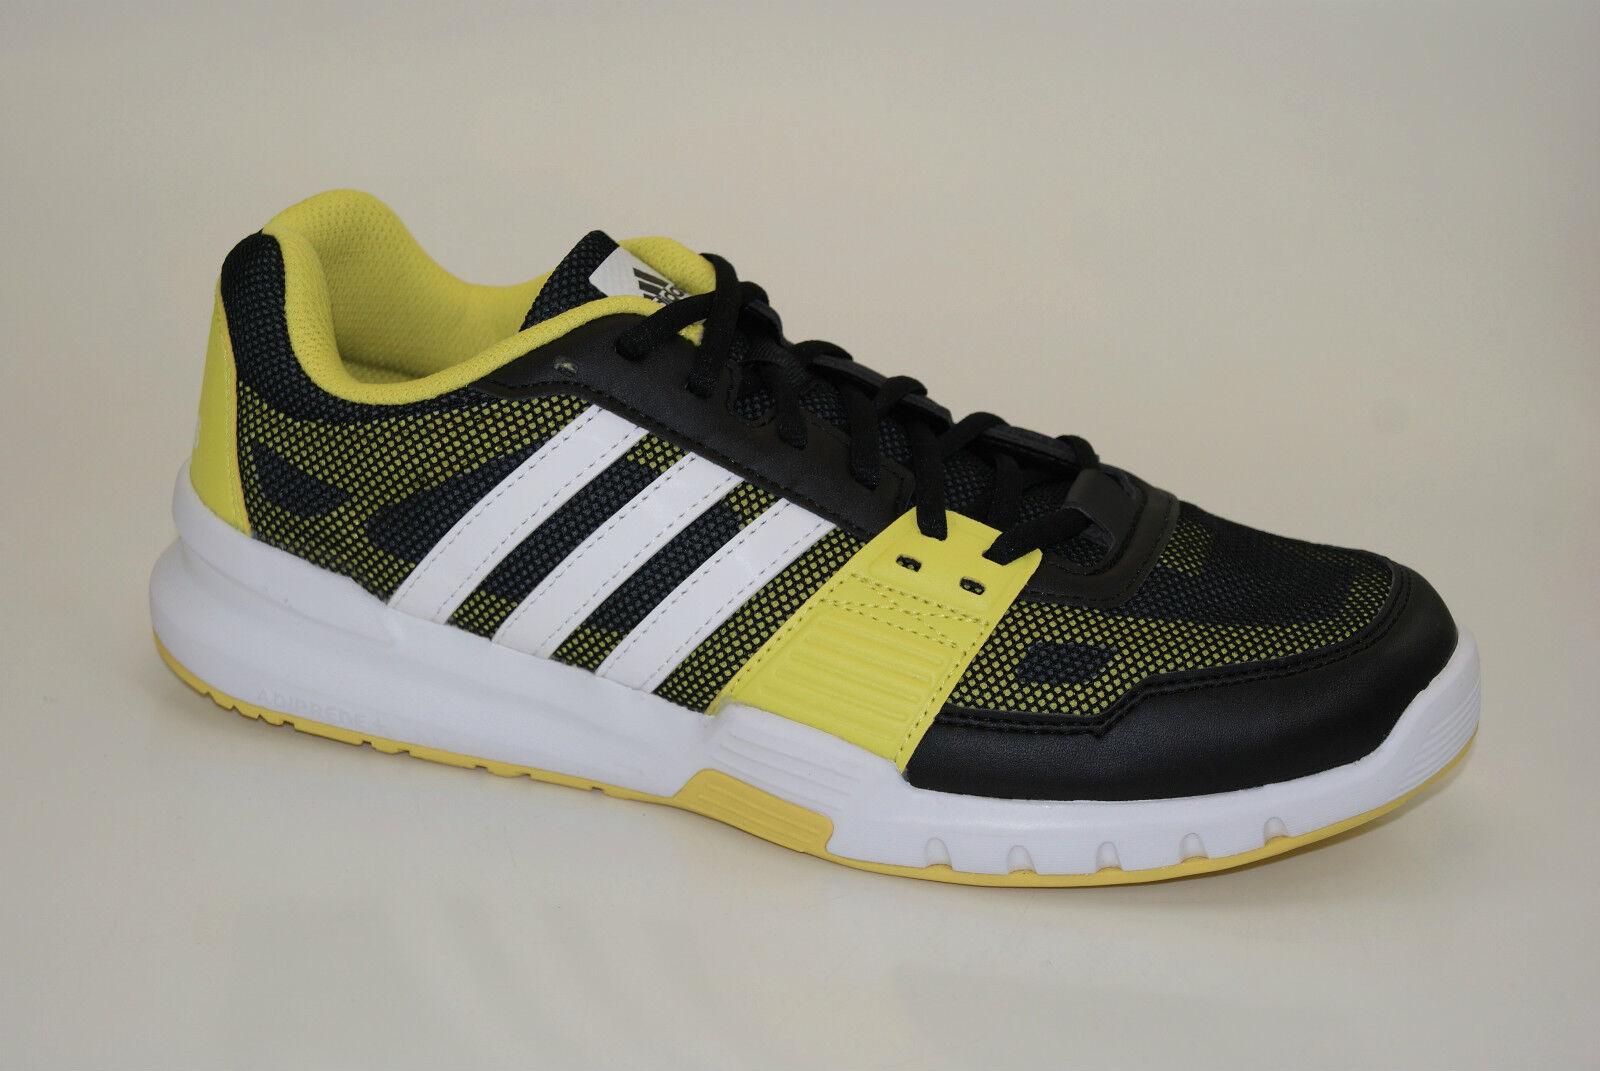 Adidas Essential Star 2 Sneakers Sportschuhe Turnschuhe Training Hallenschuhe